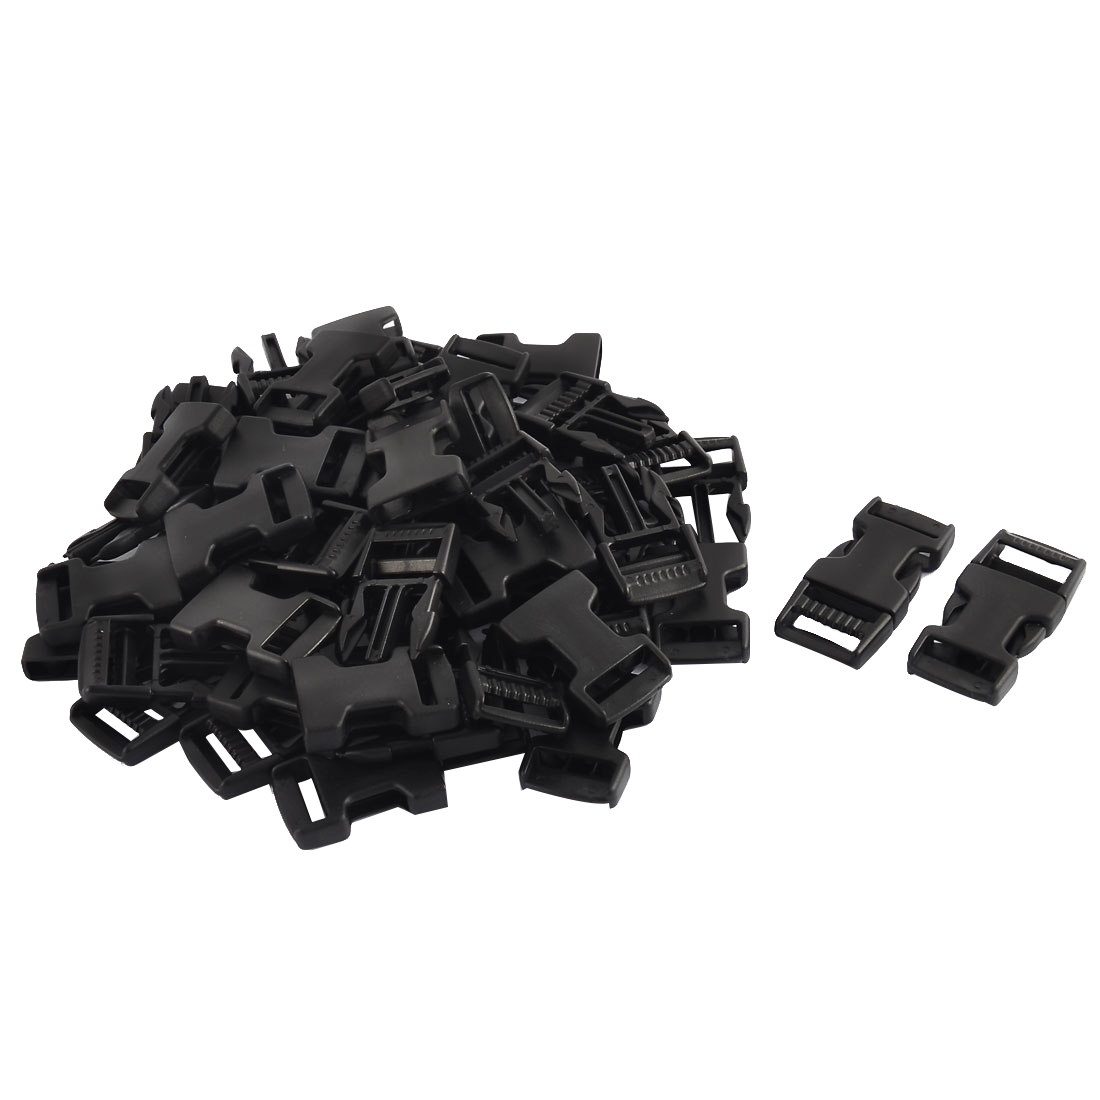 Suitcase Bag Strap Plastic Connected Side Quick Release Buckles Black 20mm 30pcs